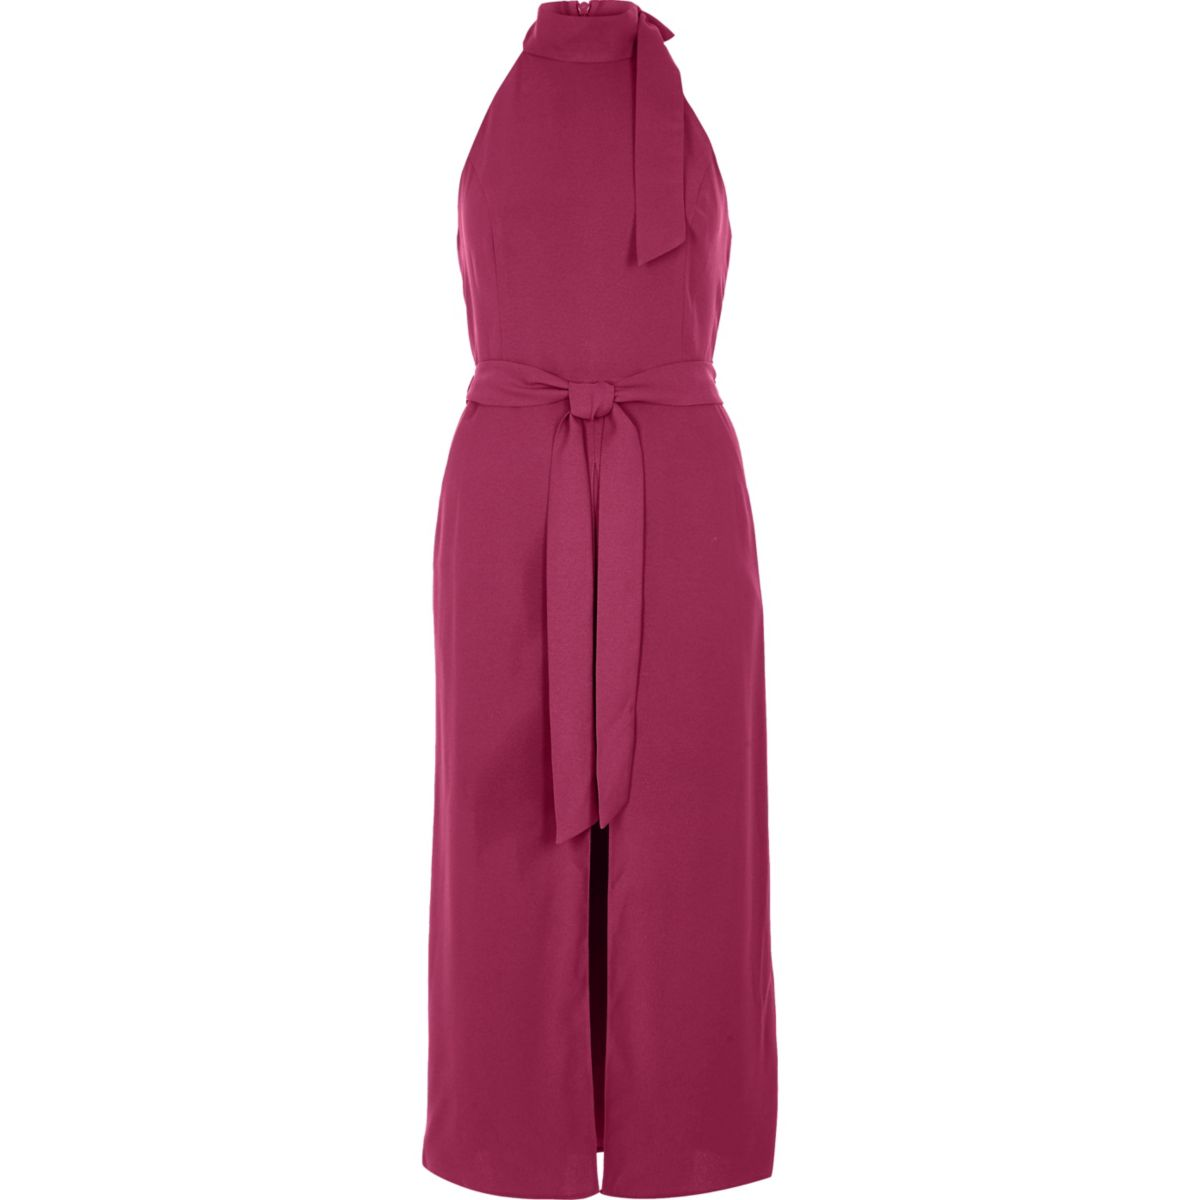 Dark pink sleeveless belted high neck dress